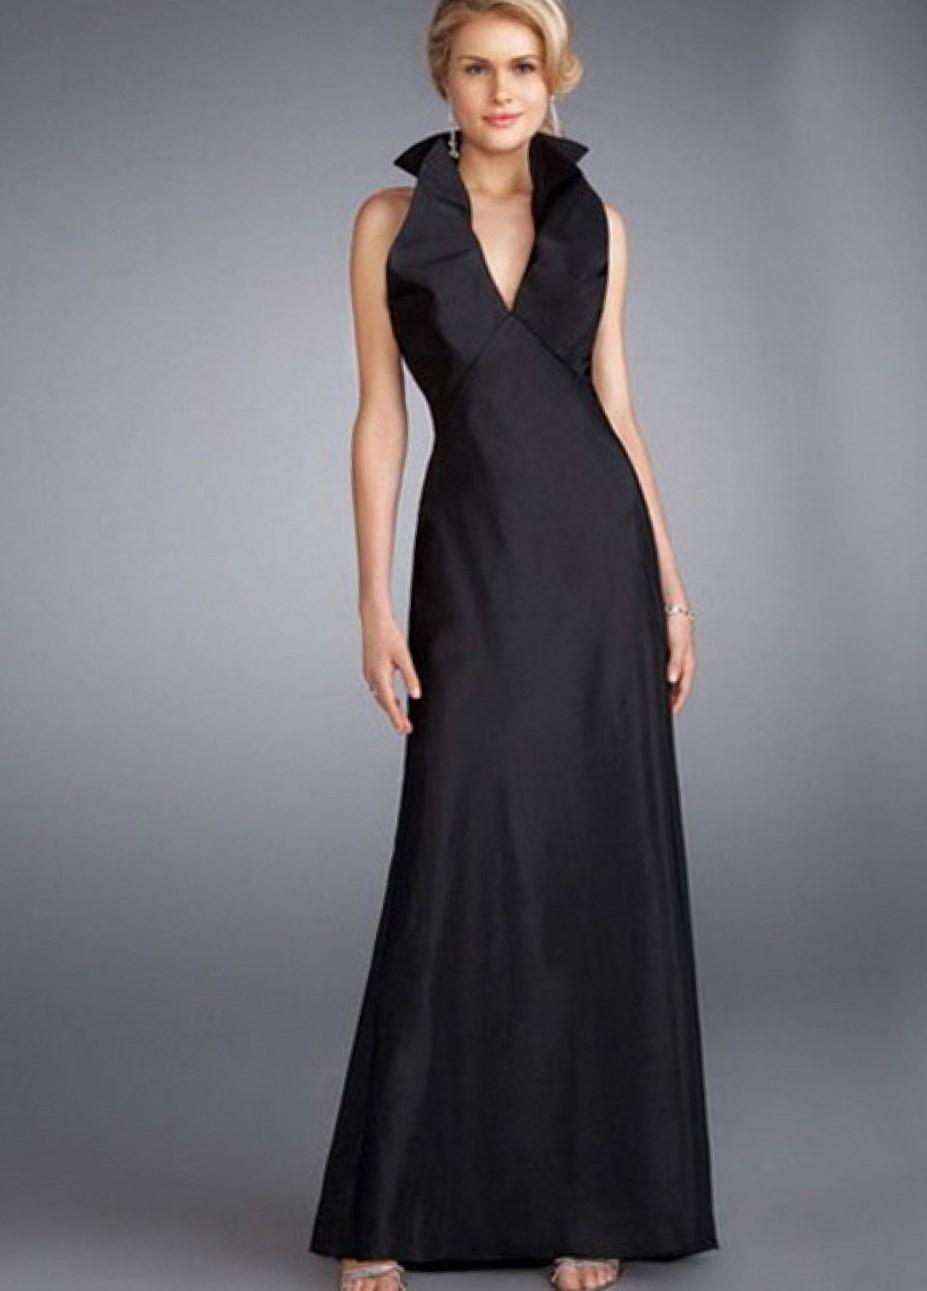 nordstrom rack plus size evening dresses photo - 1